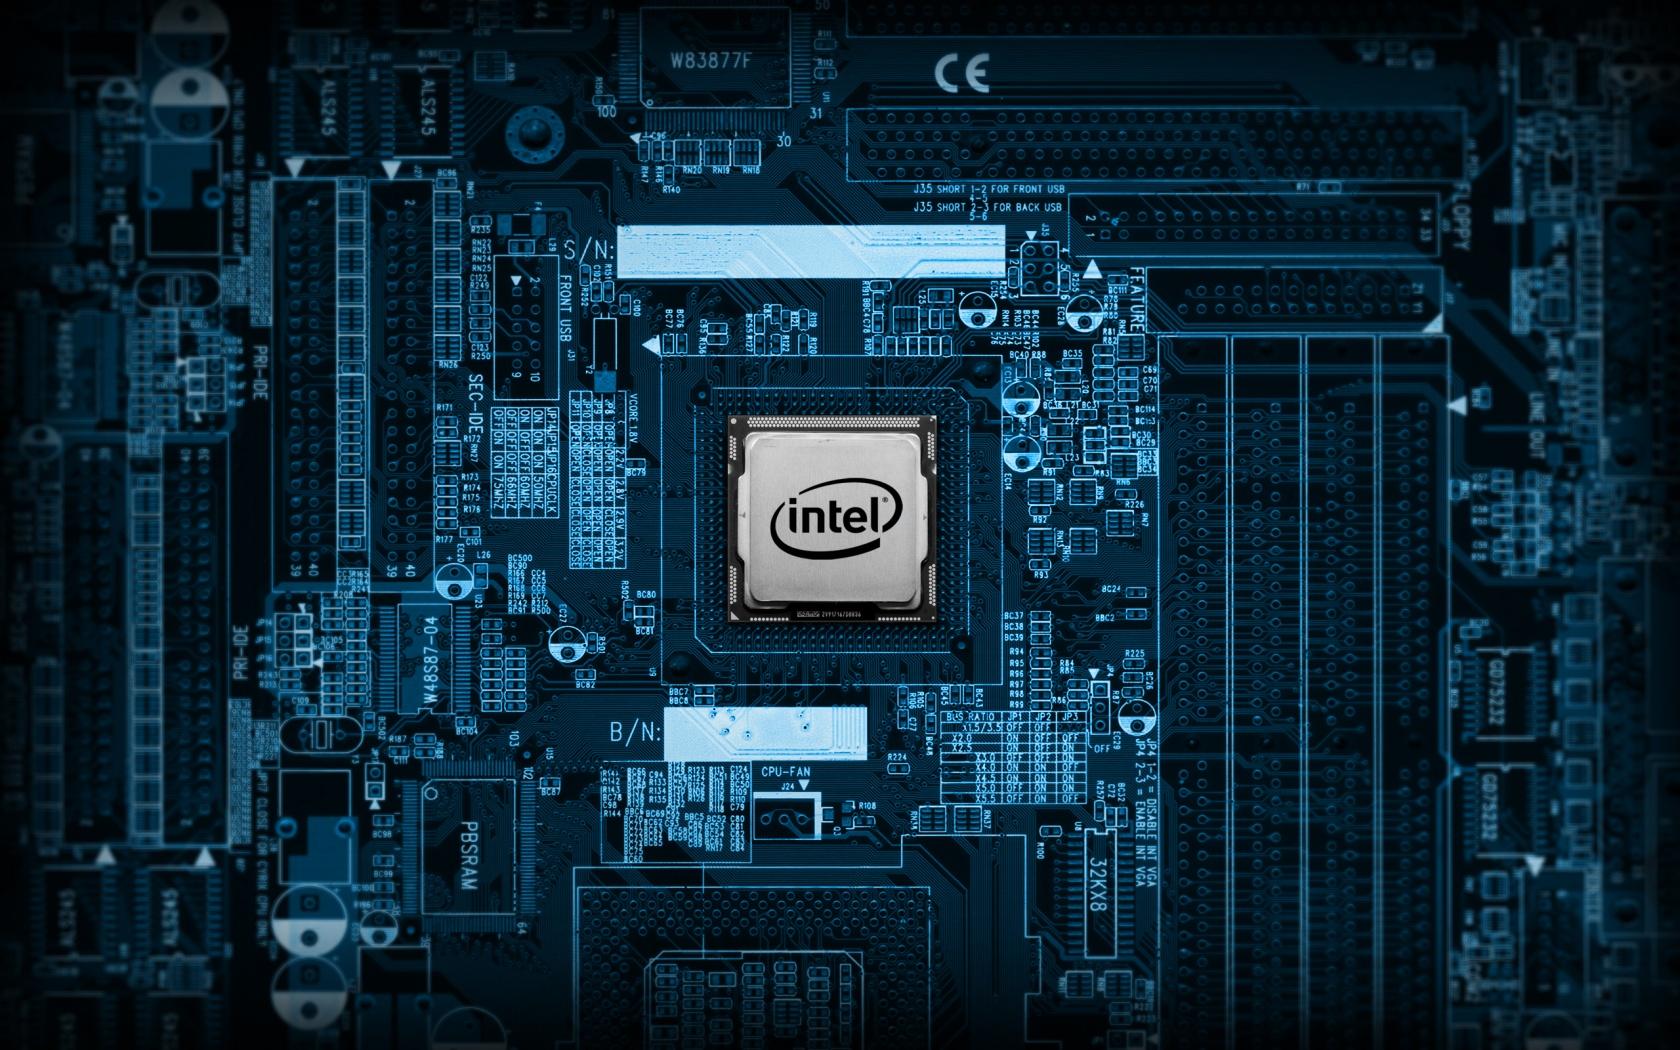 intel_chip-1680x1050.jpg